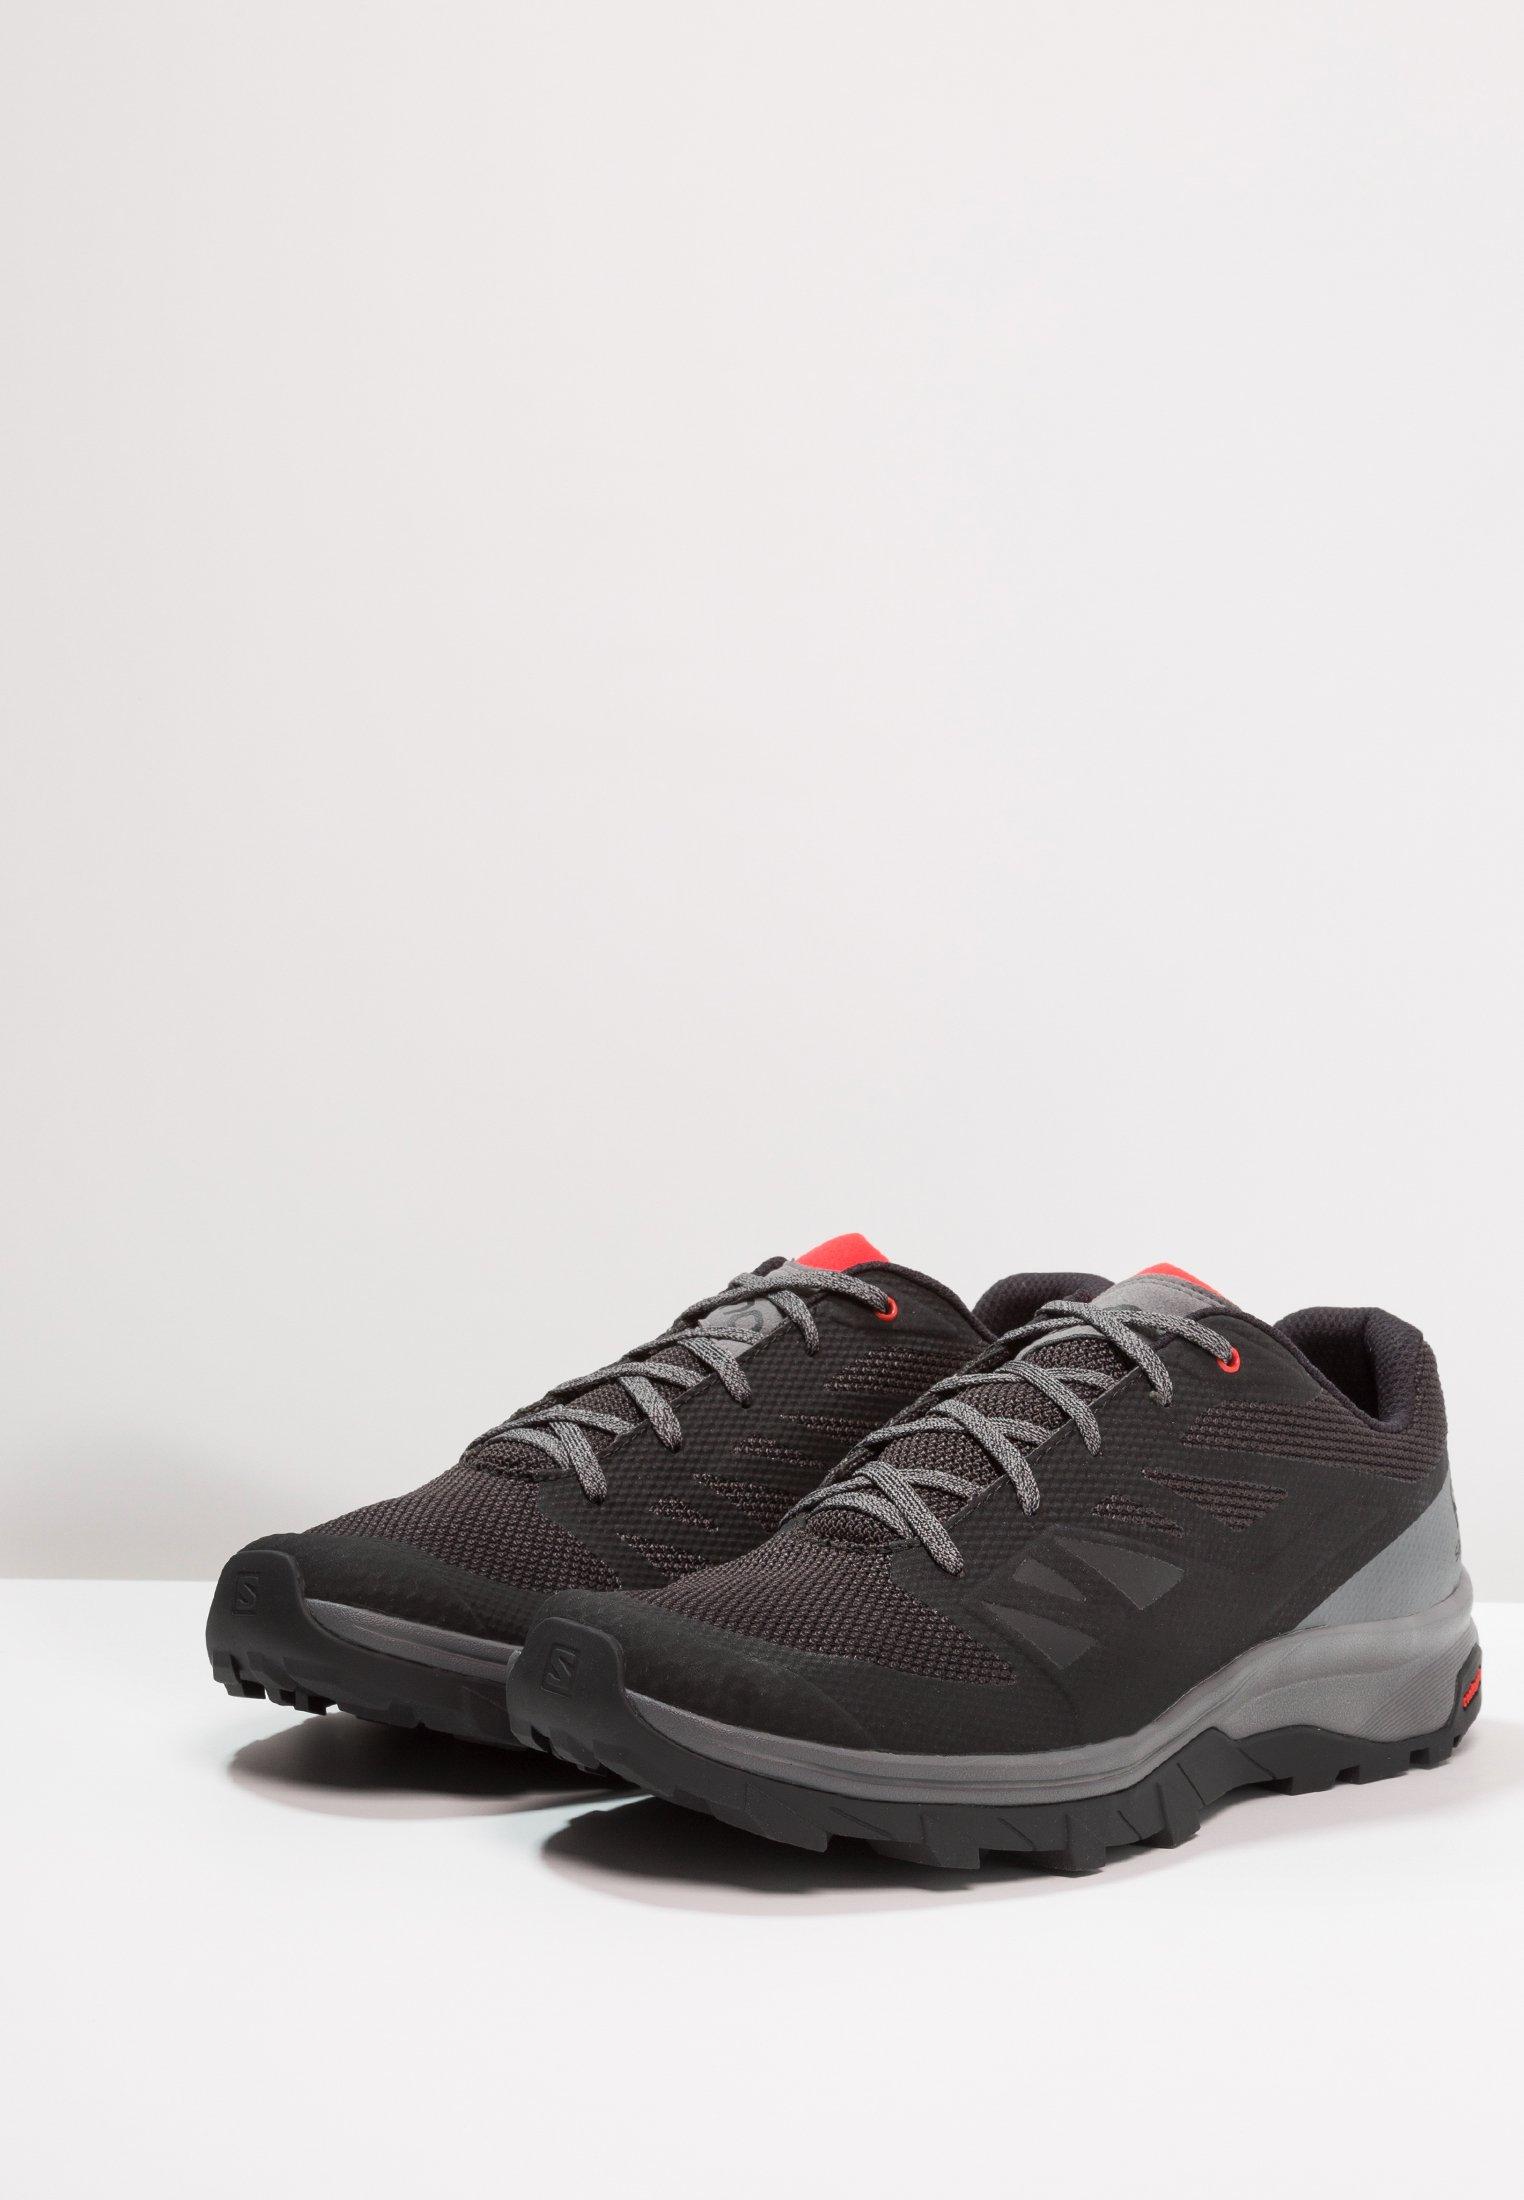 OUTLINE Hikingskor blackquiet shadehigh risk red